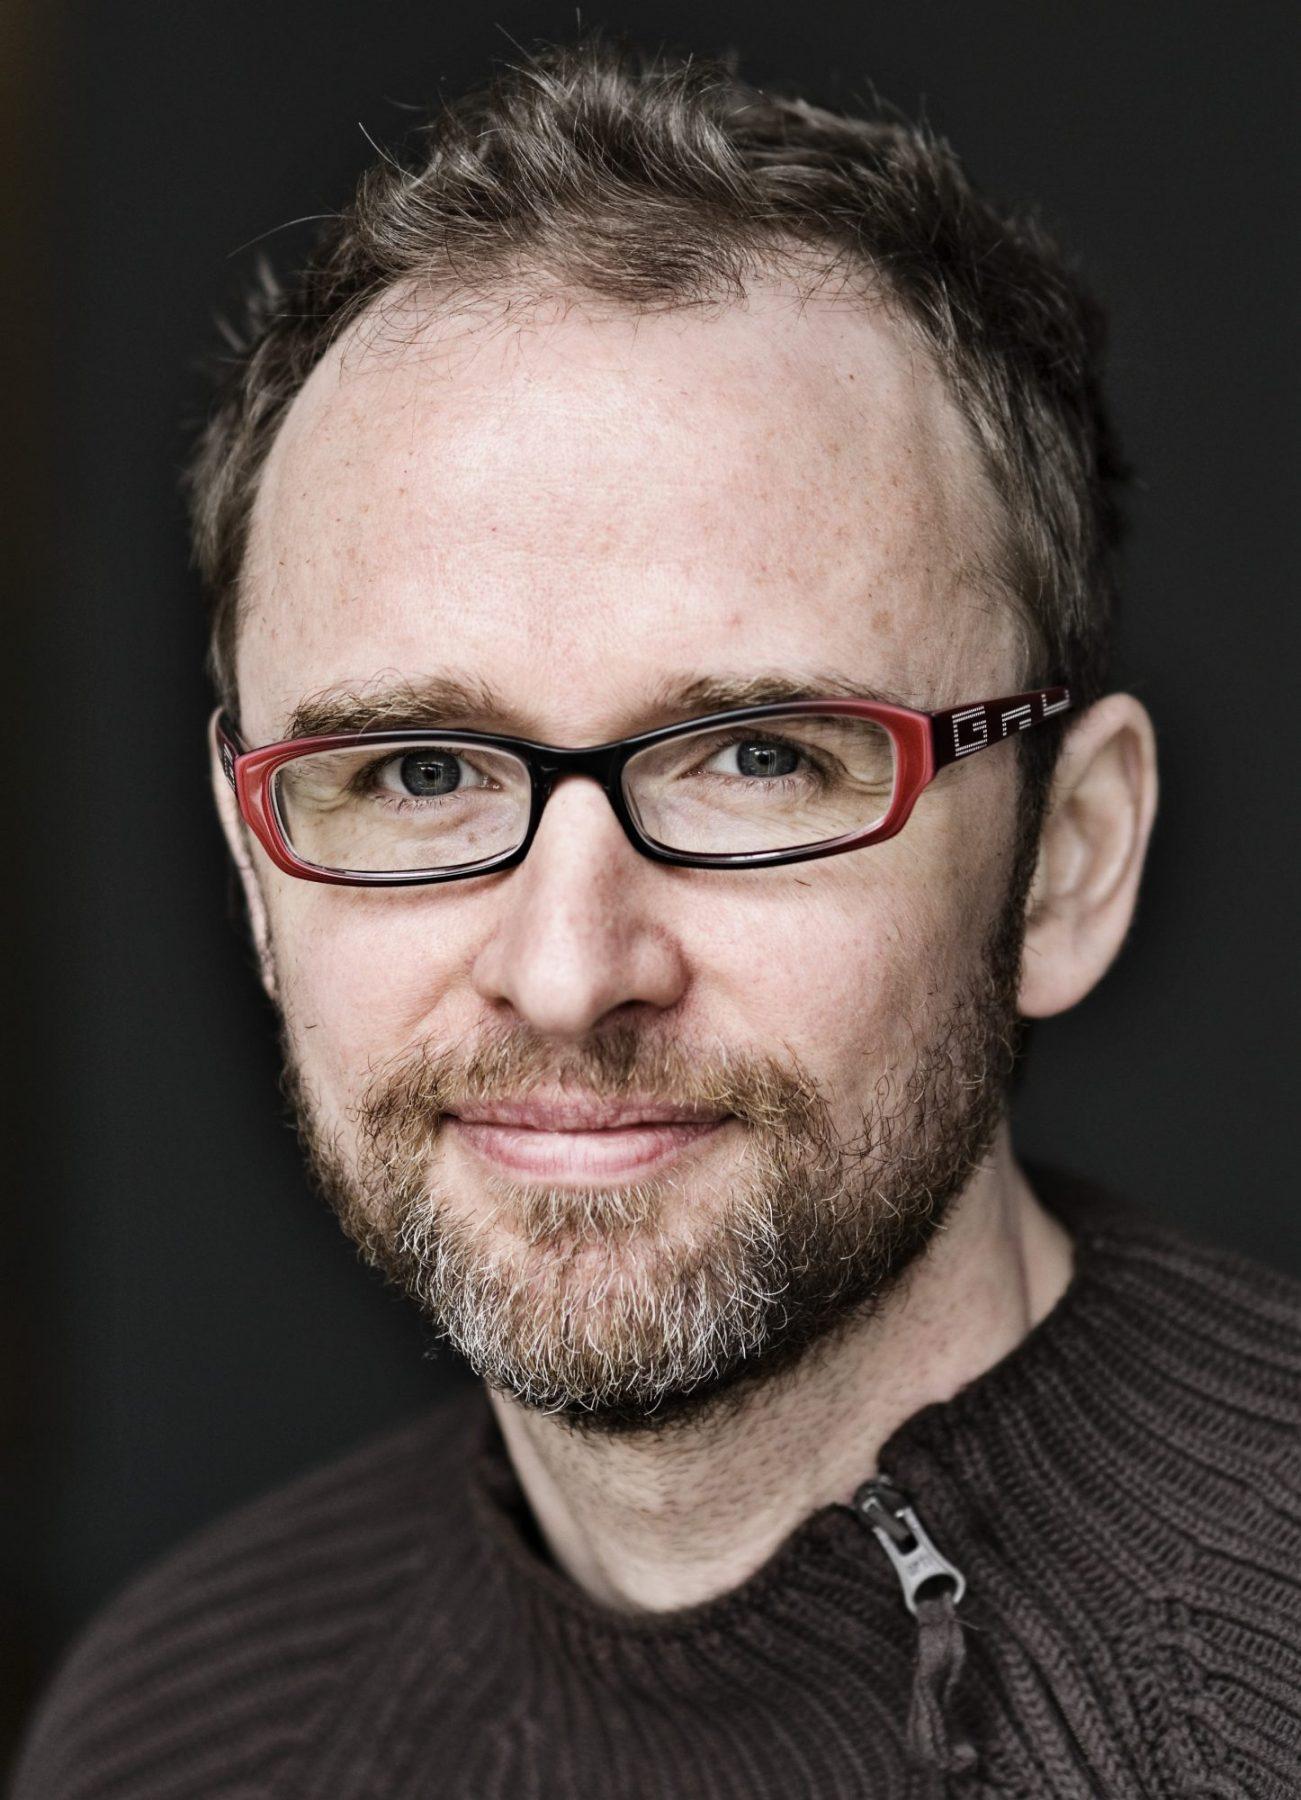 Carl Hargreaves Yoga Teacher in North London